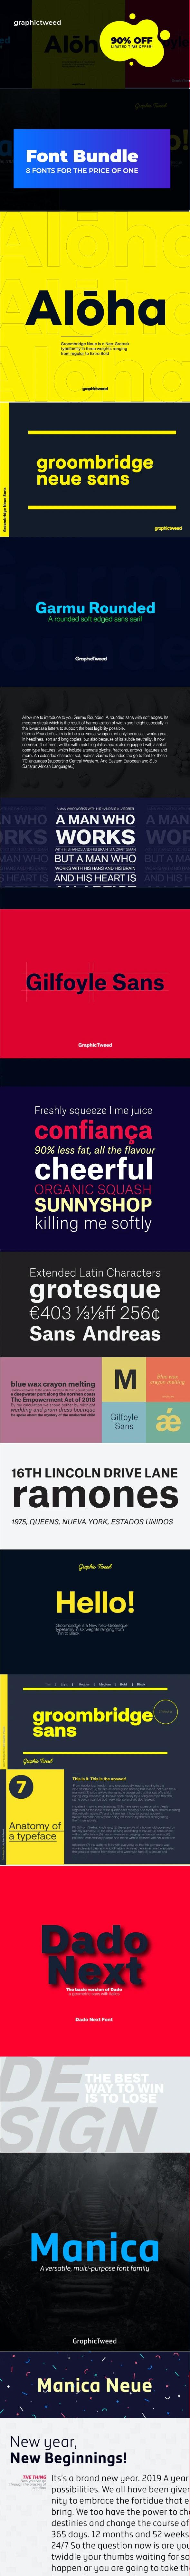 Font Bundle (9 Fonts for the Price of 1) - Miscellaneous Sans-Serif